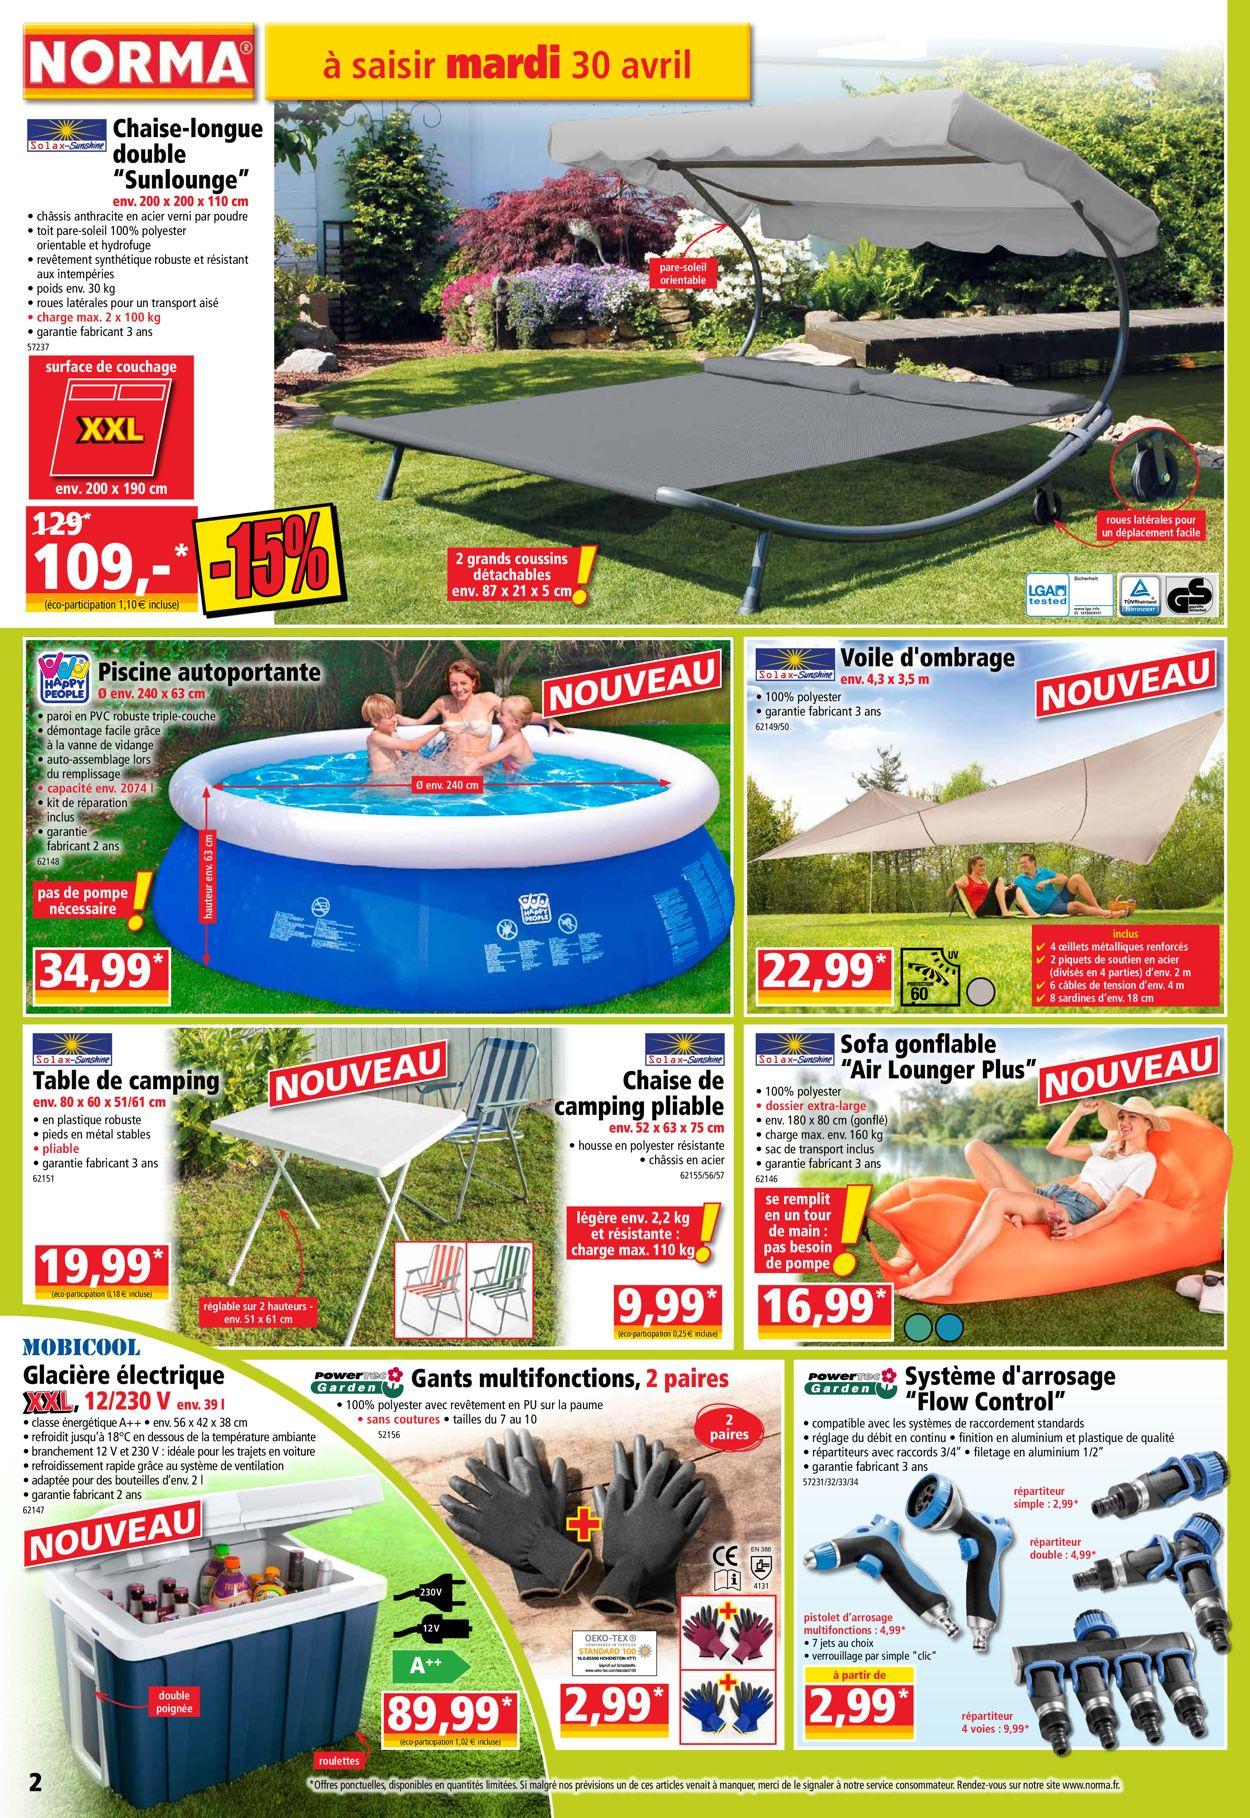 Norma Catalogue - 30.04-07.05.2019 (Page 2)